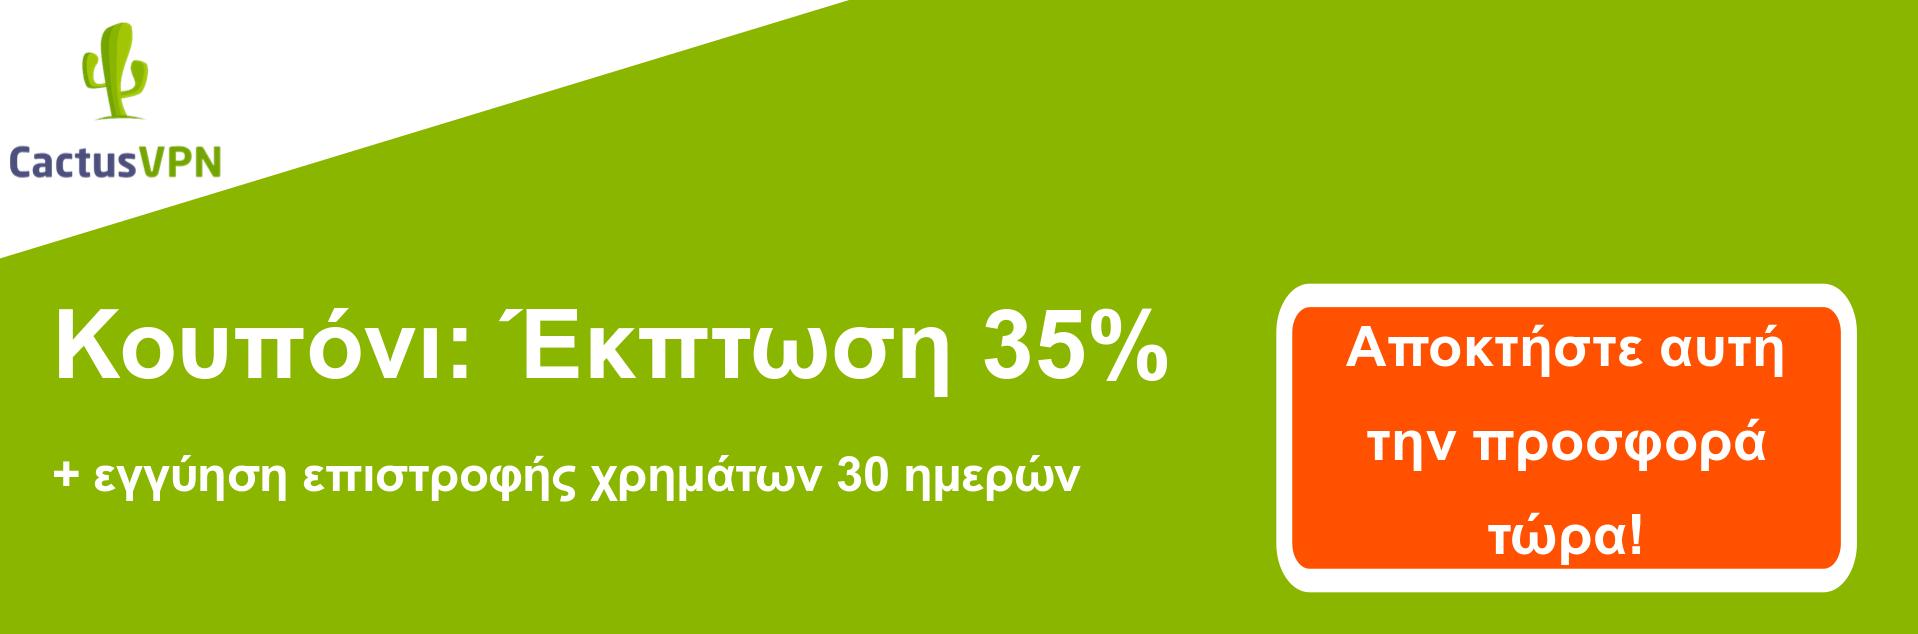 CoupusVPN banner κουπονιού - έκπτωση 38%